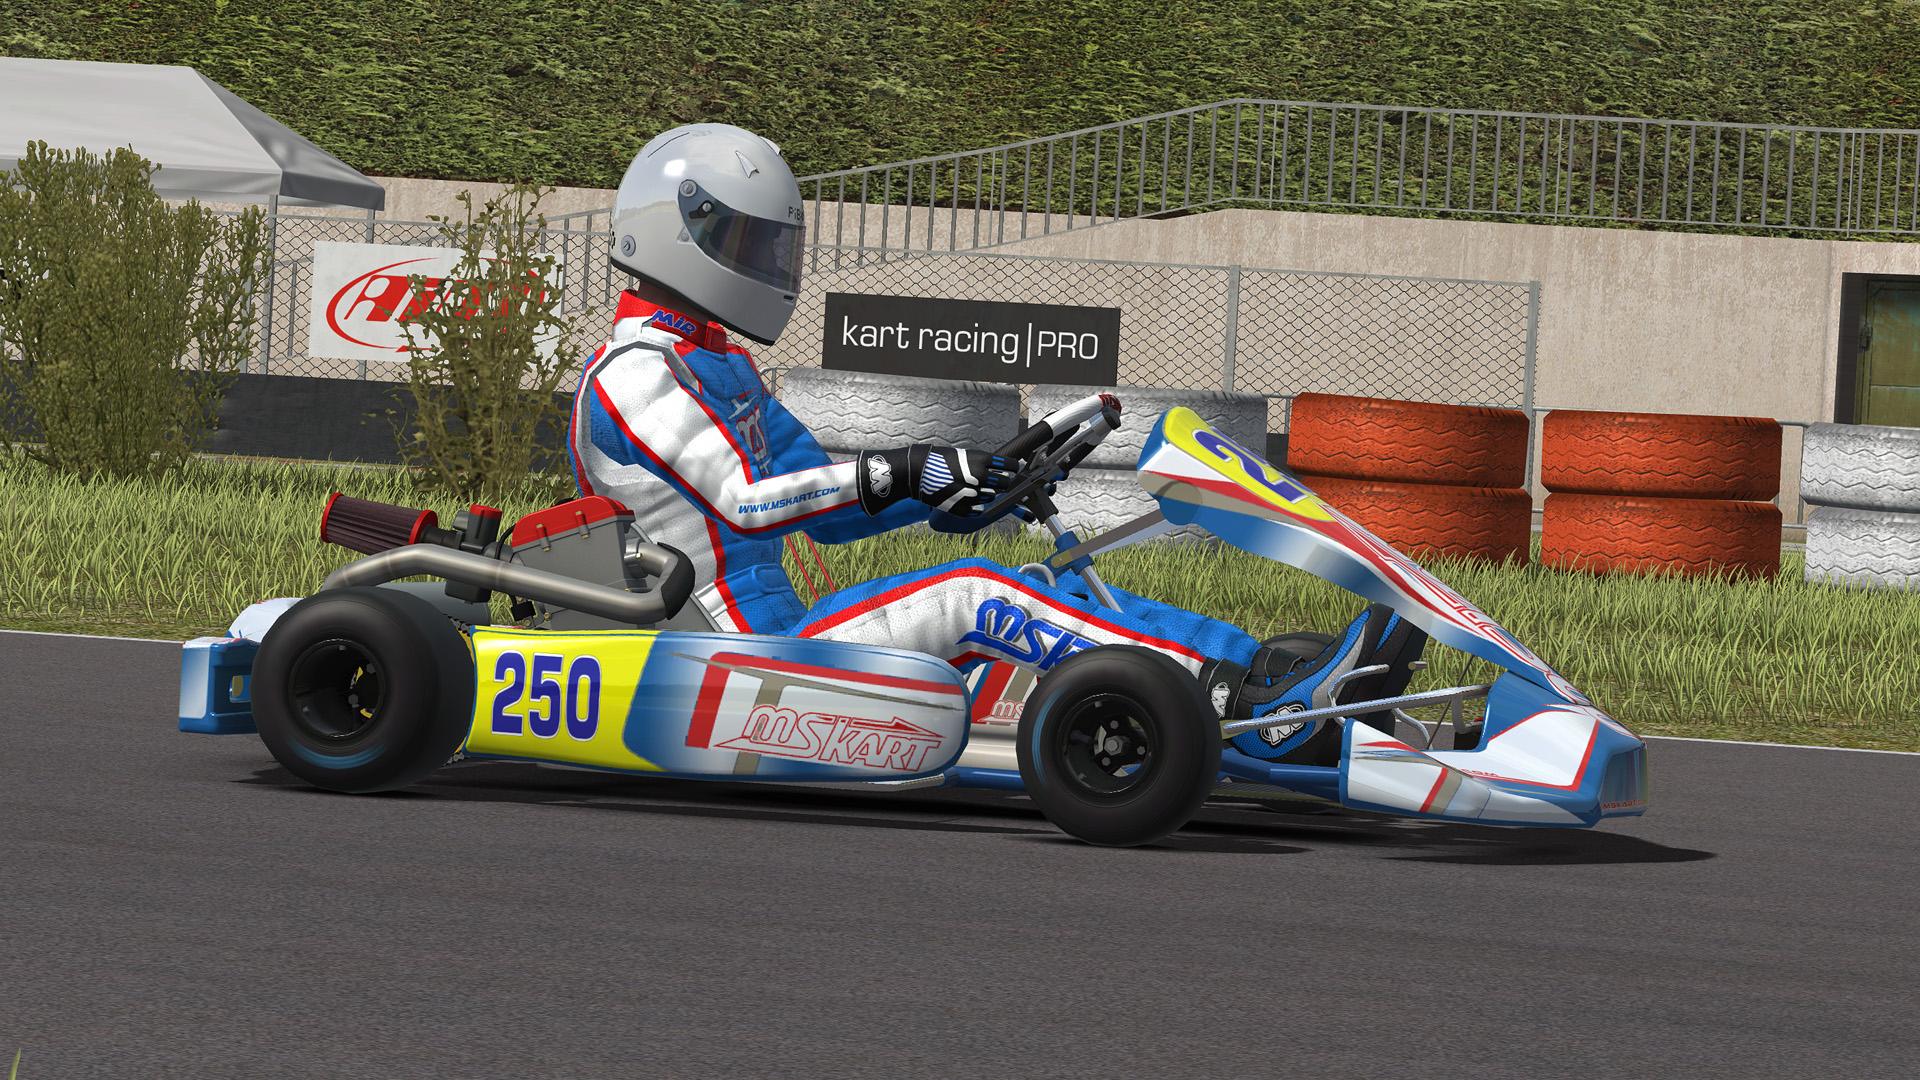 Kart Racing Pro Update.jpg